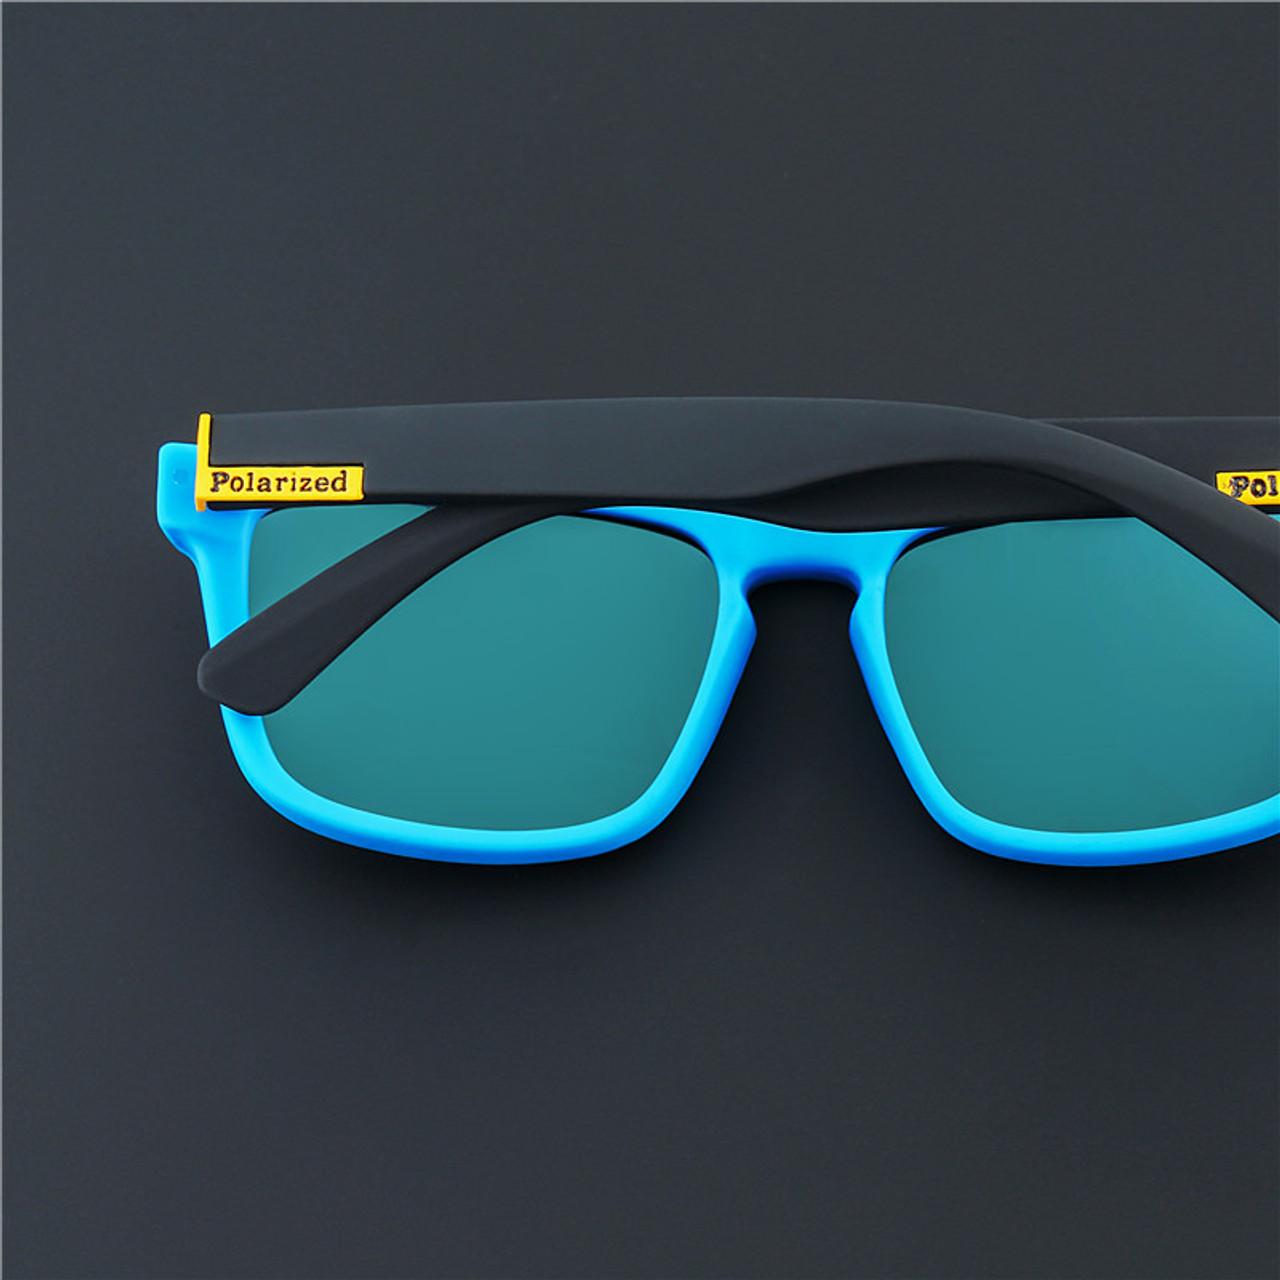 fd2b5421ce ... 2019 Polarized Sunglasses Men s Aviation Driving Shades Male Sun Glasses  For Men Retro Cheap Luxury Women ...